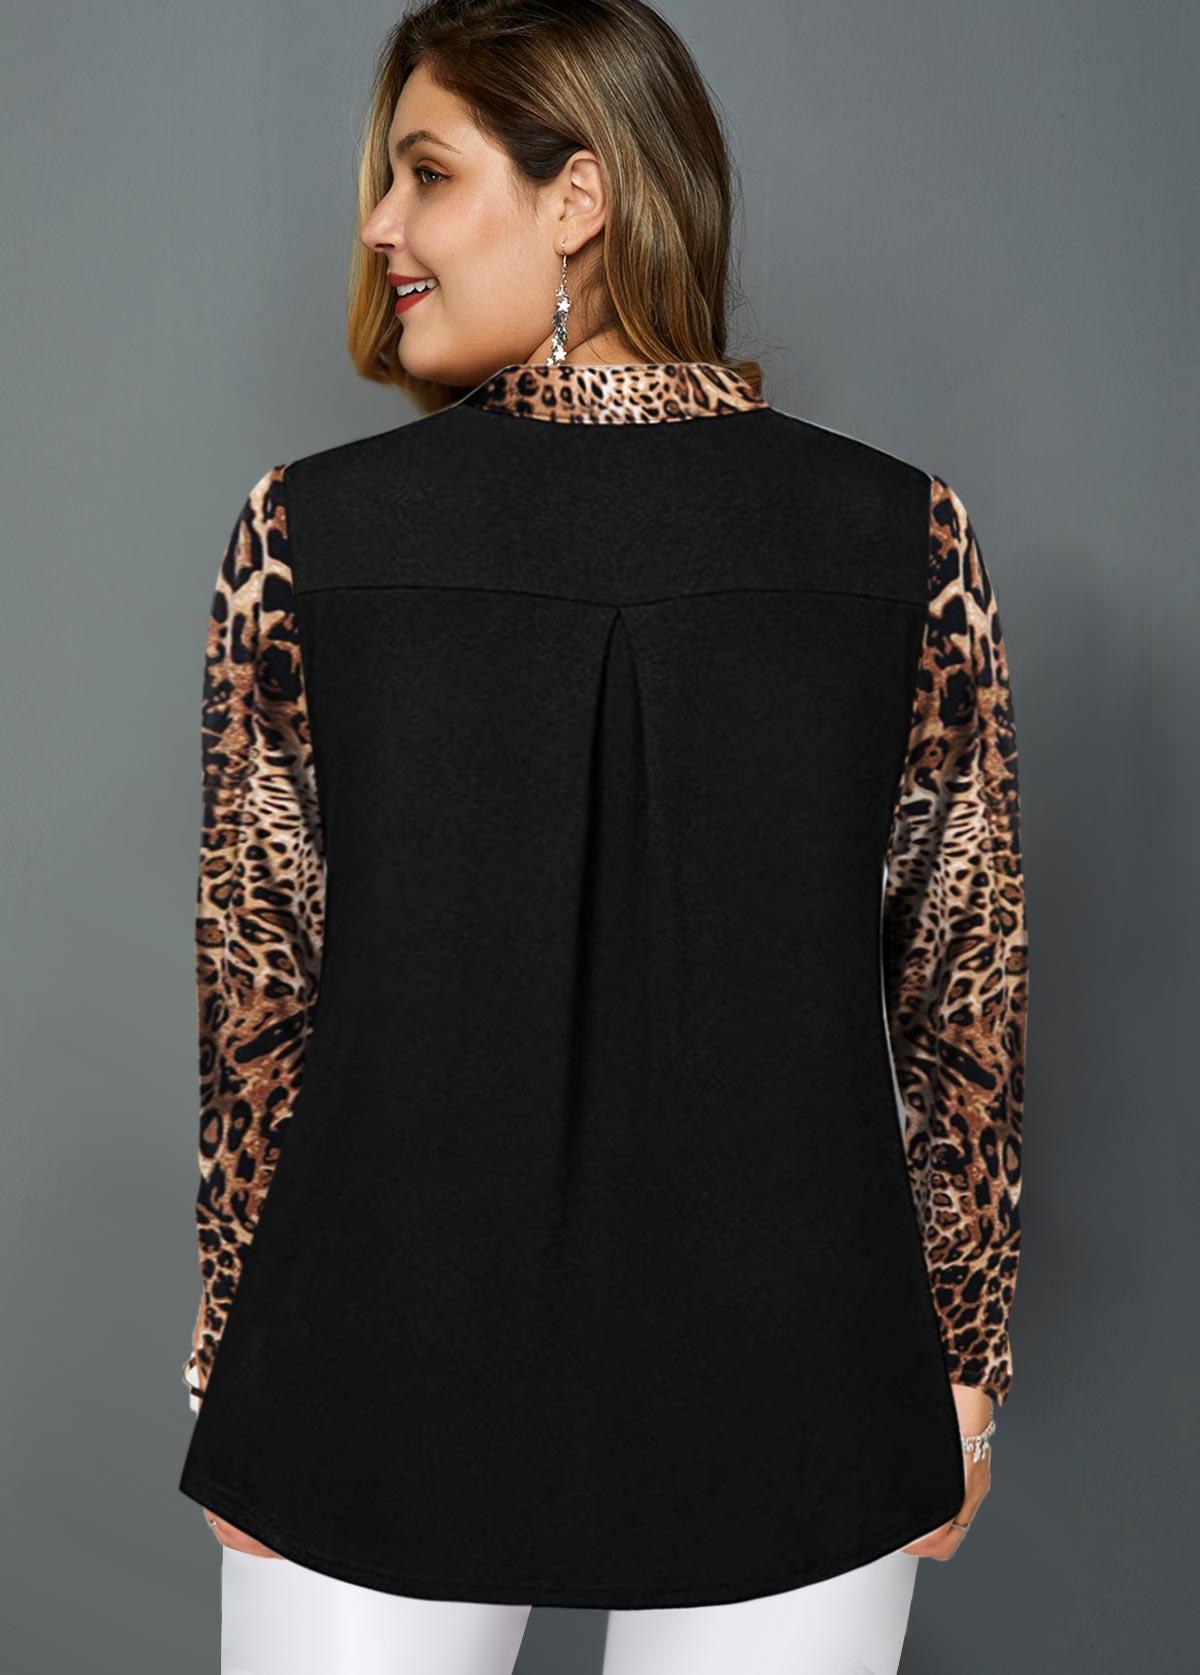 Quarter Zip Long Sleeve Leopard Blouse